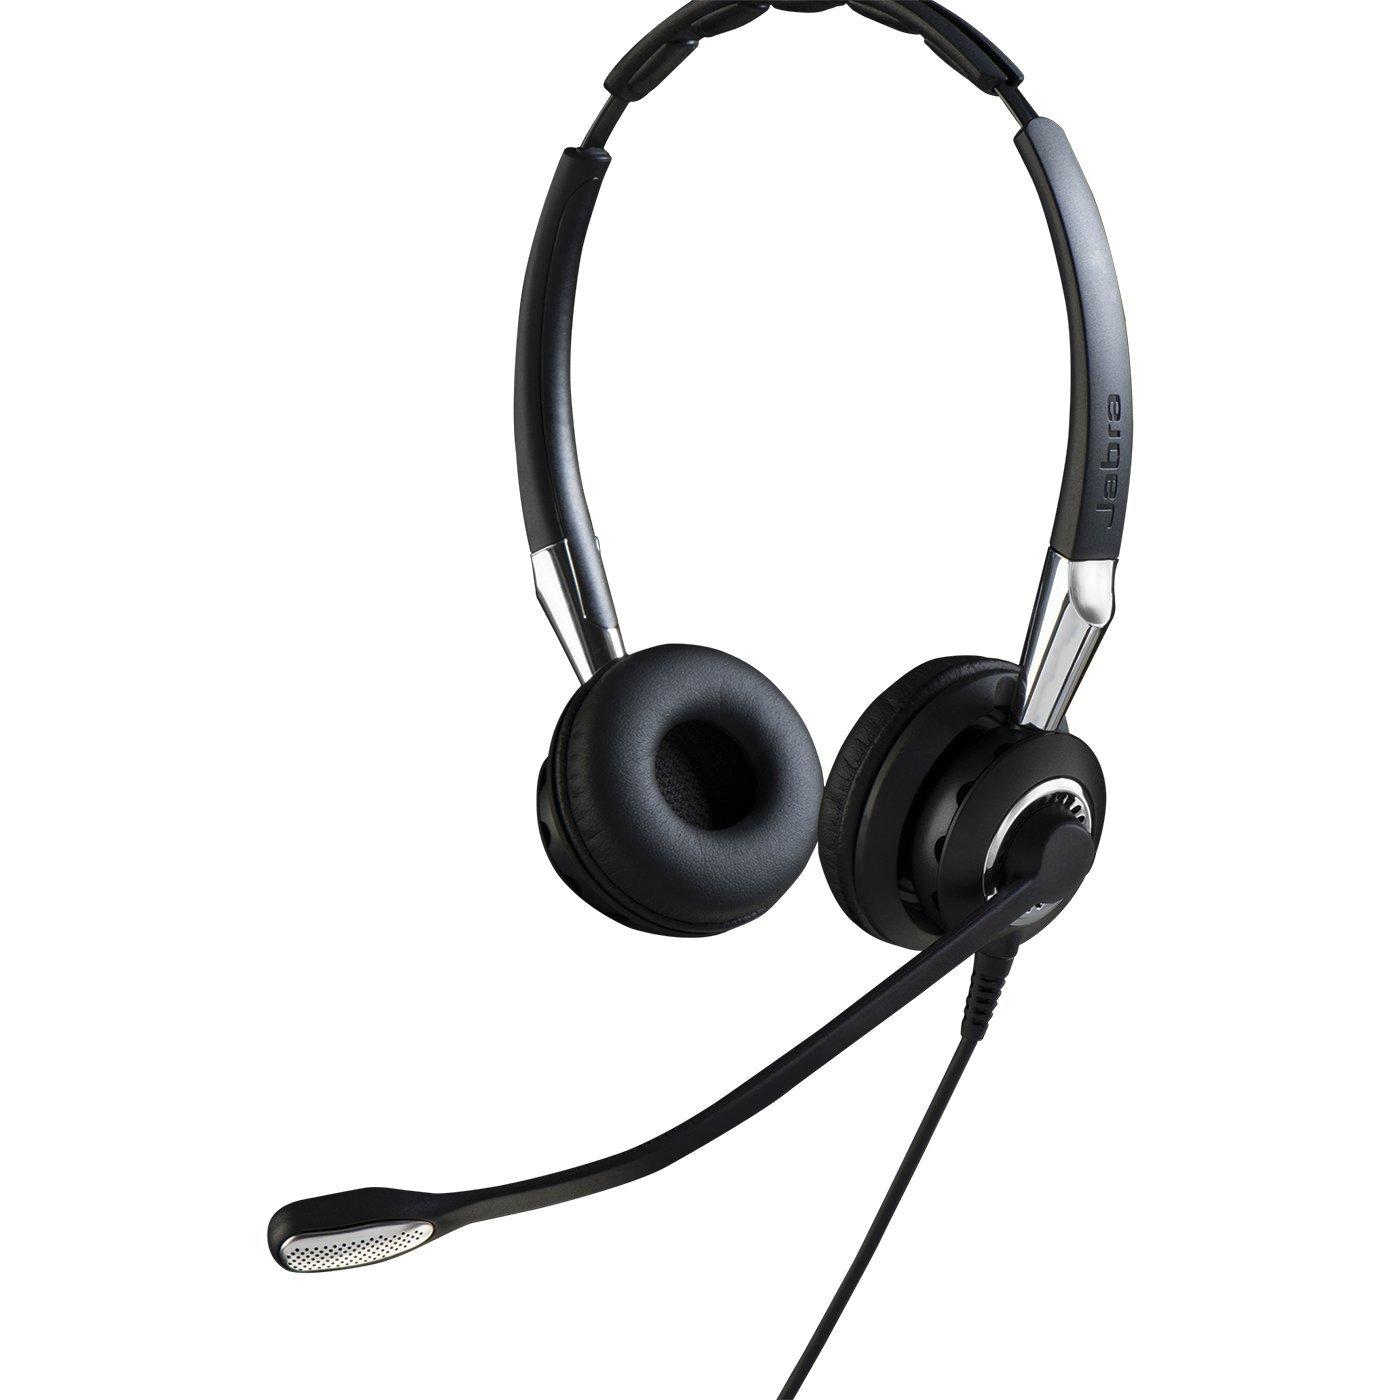 Casca Bluetooth Jabra BIZ 2400 Duo QD NC Wideband